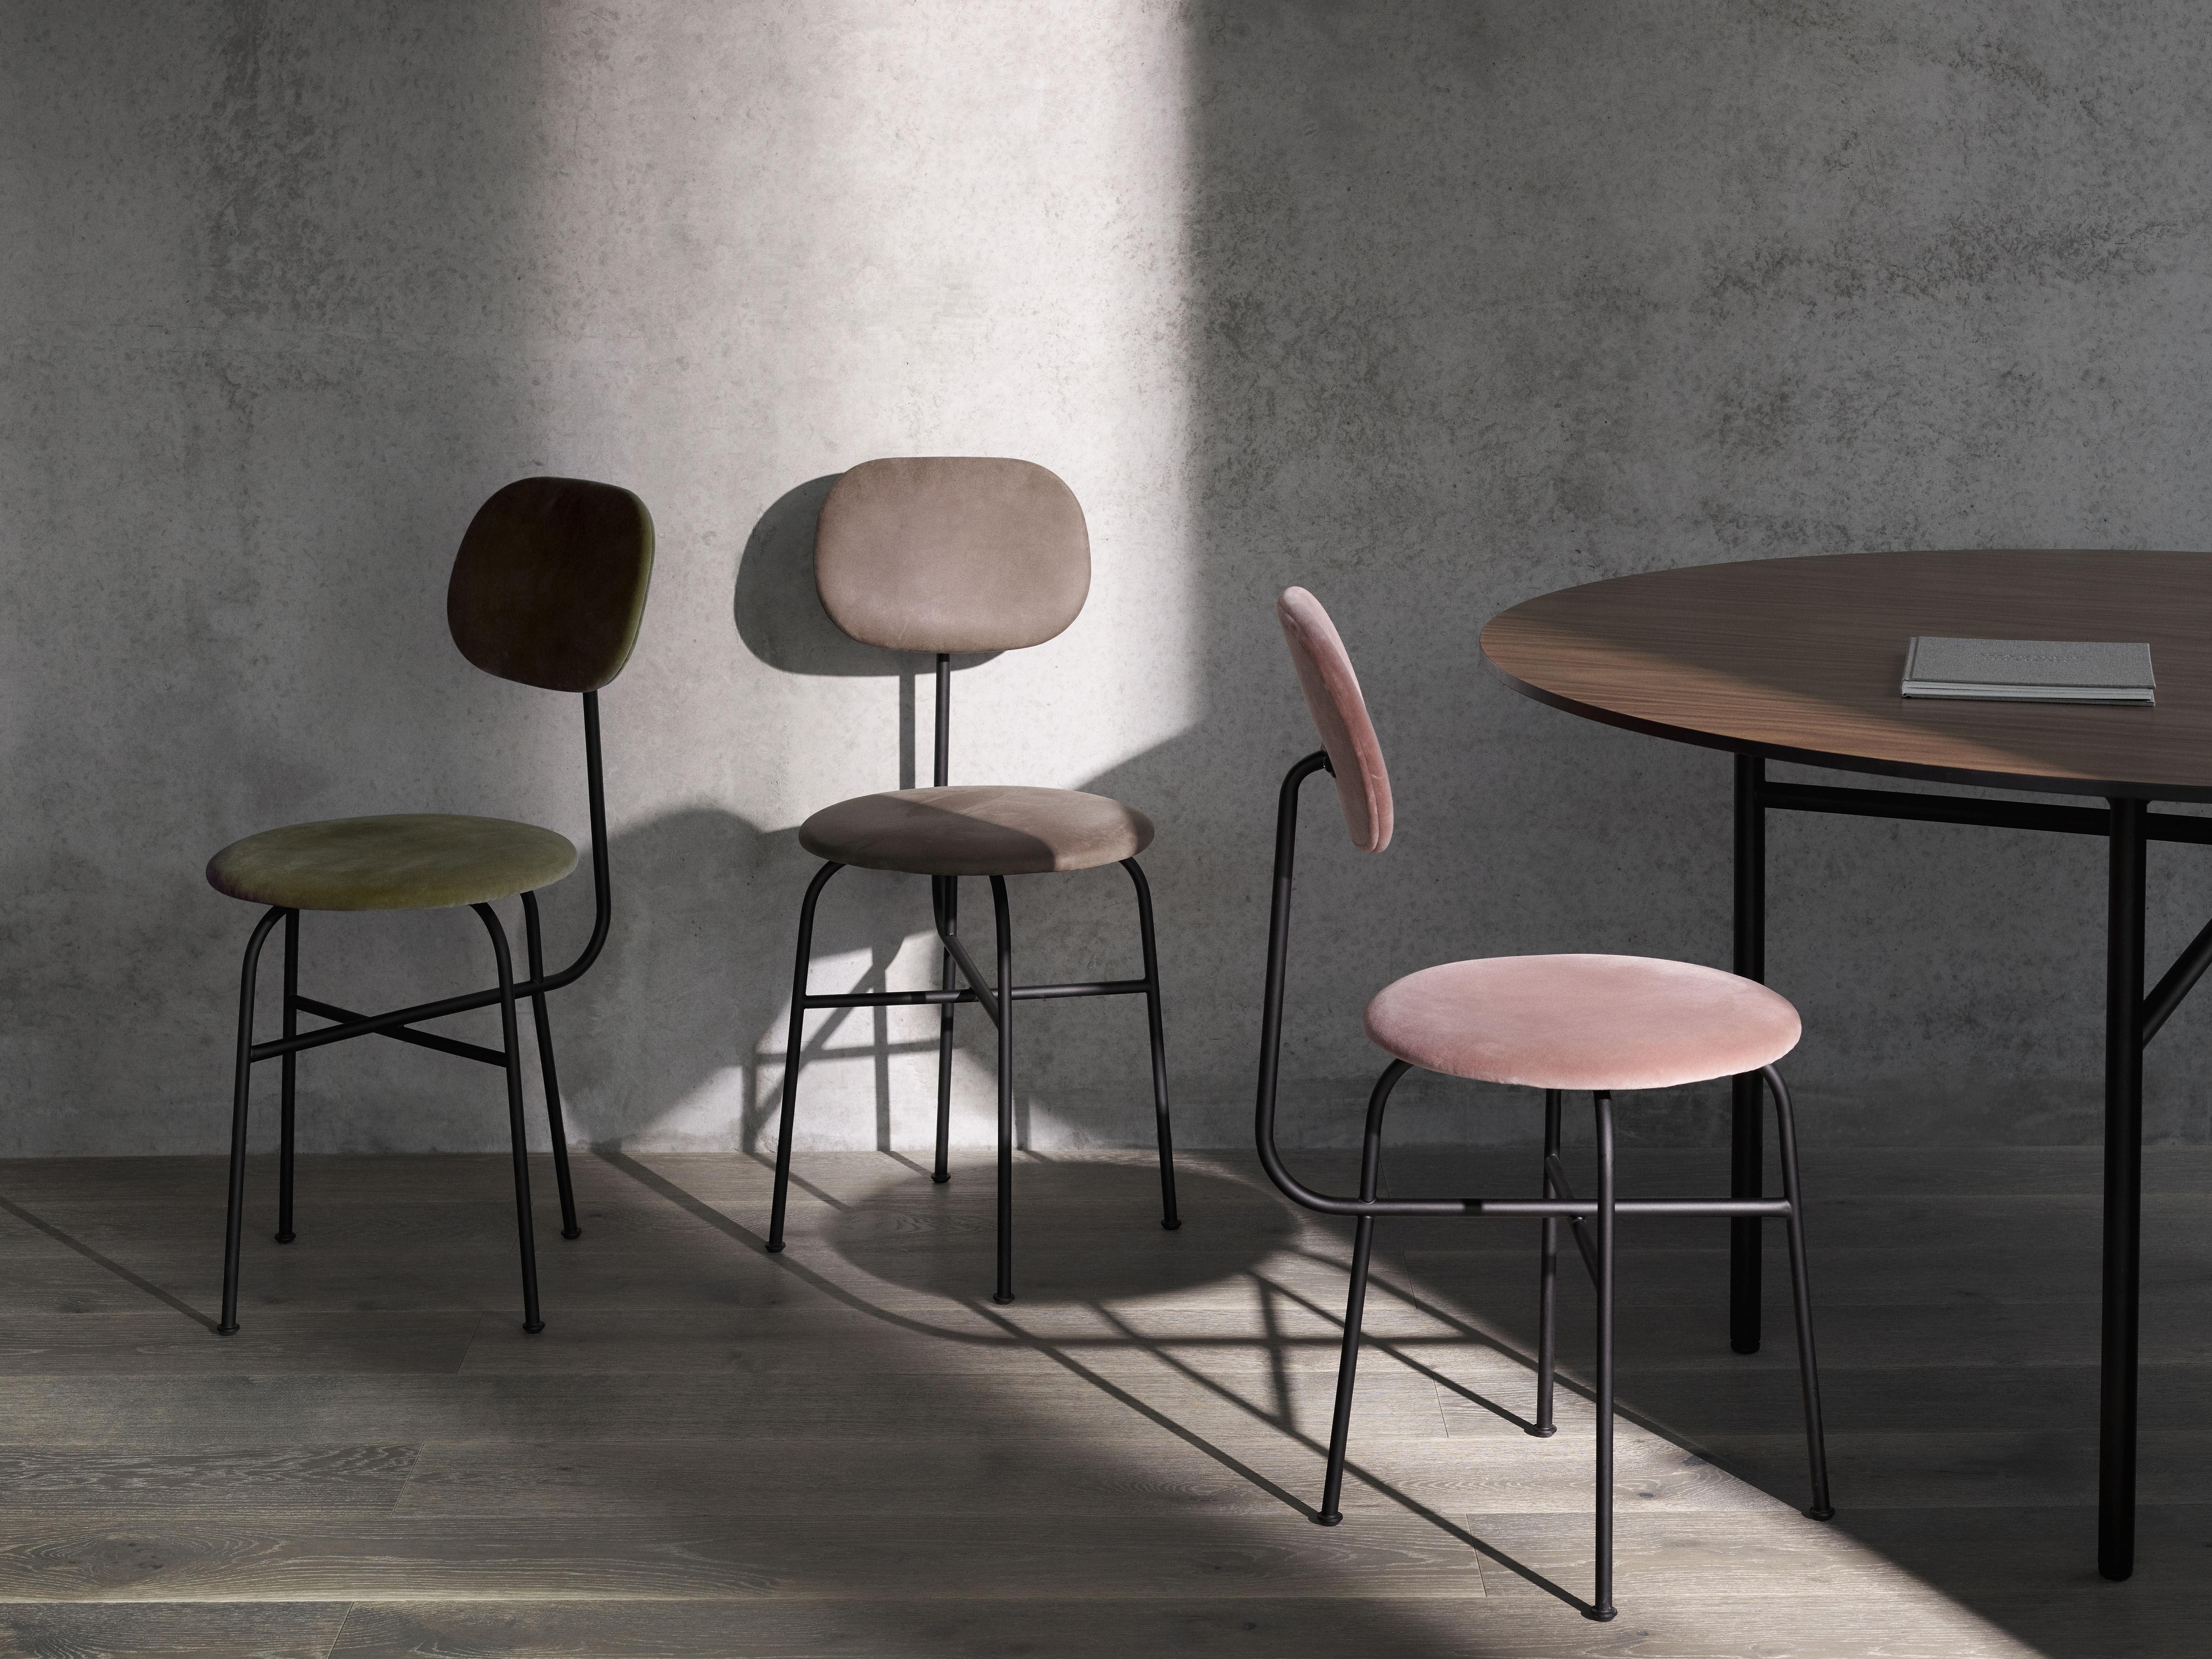 Sedia Imbottita Design : Afteroom sedia imbottita velluto velluto rosa nero by menu